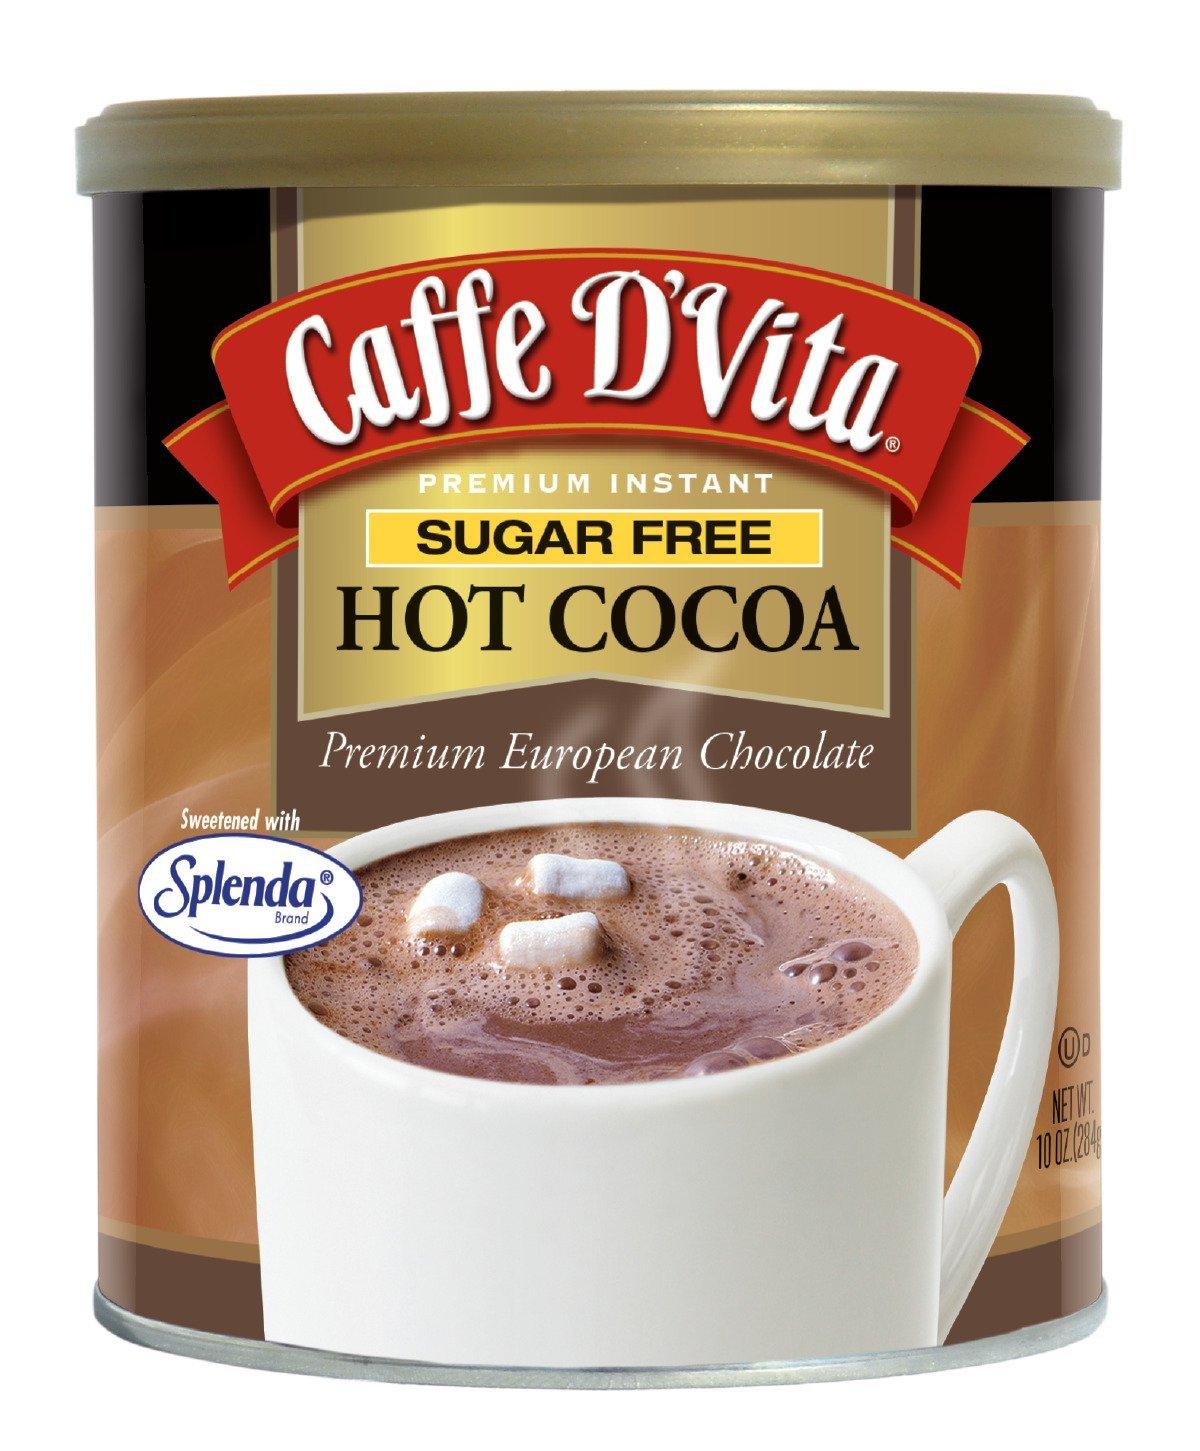 Amazon.com : Caffe D'Vita Sugar Free Hot Cocoa, 10 Ounce Can : Hot ...